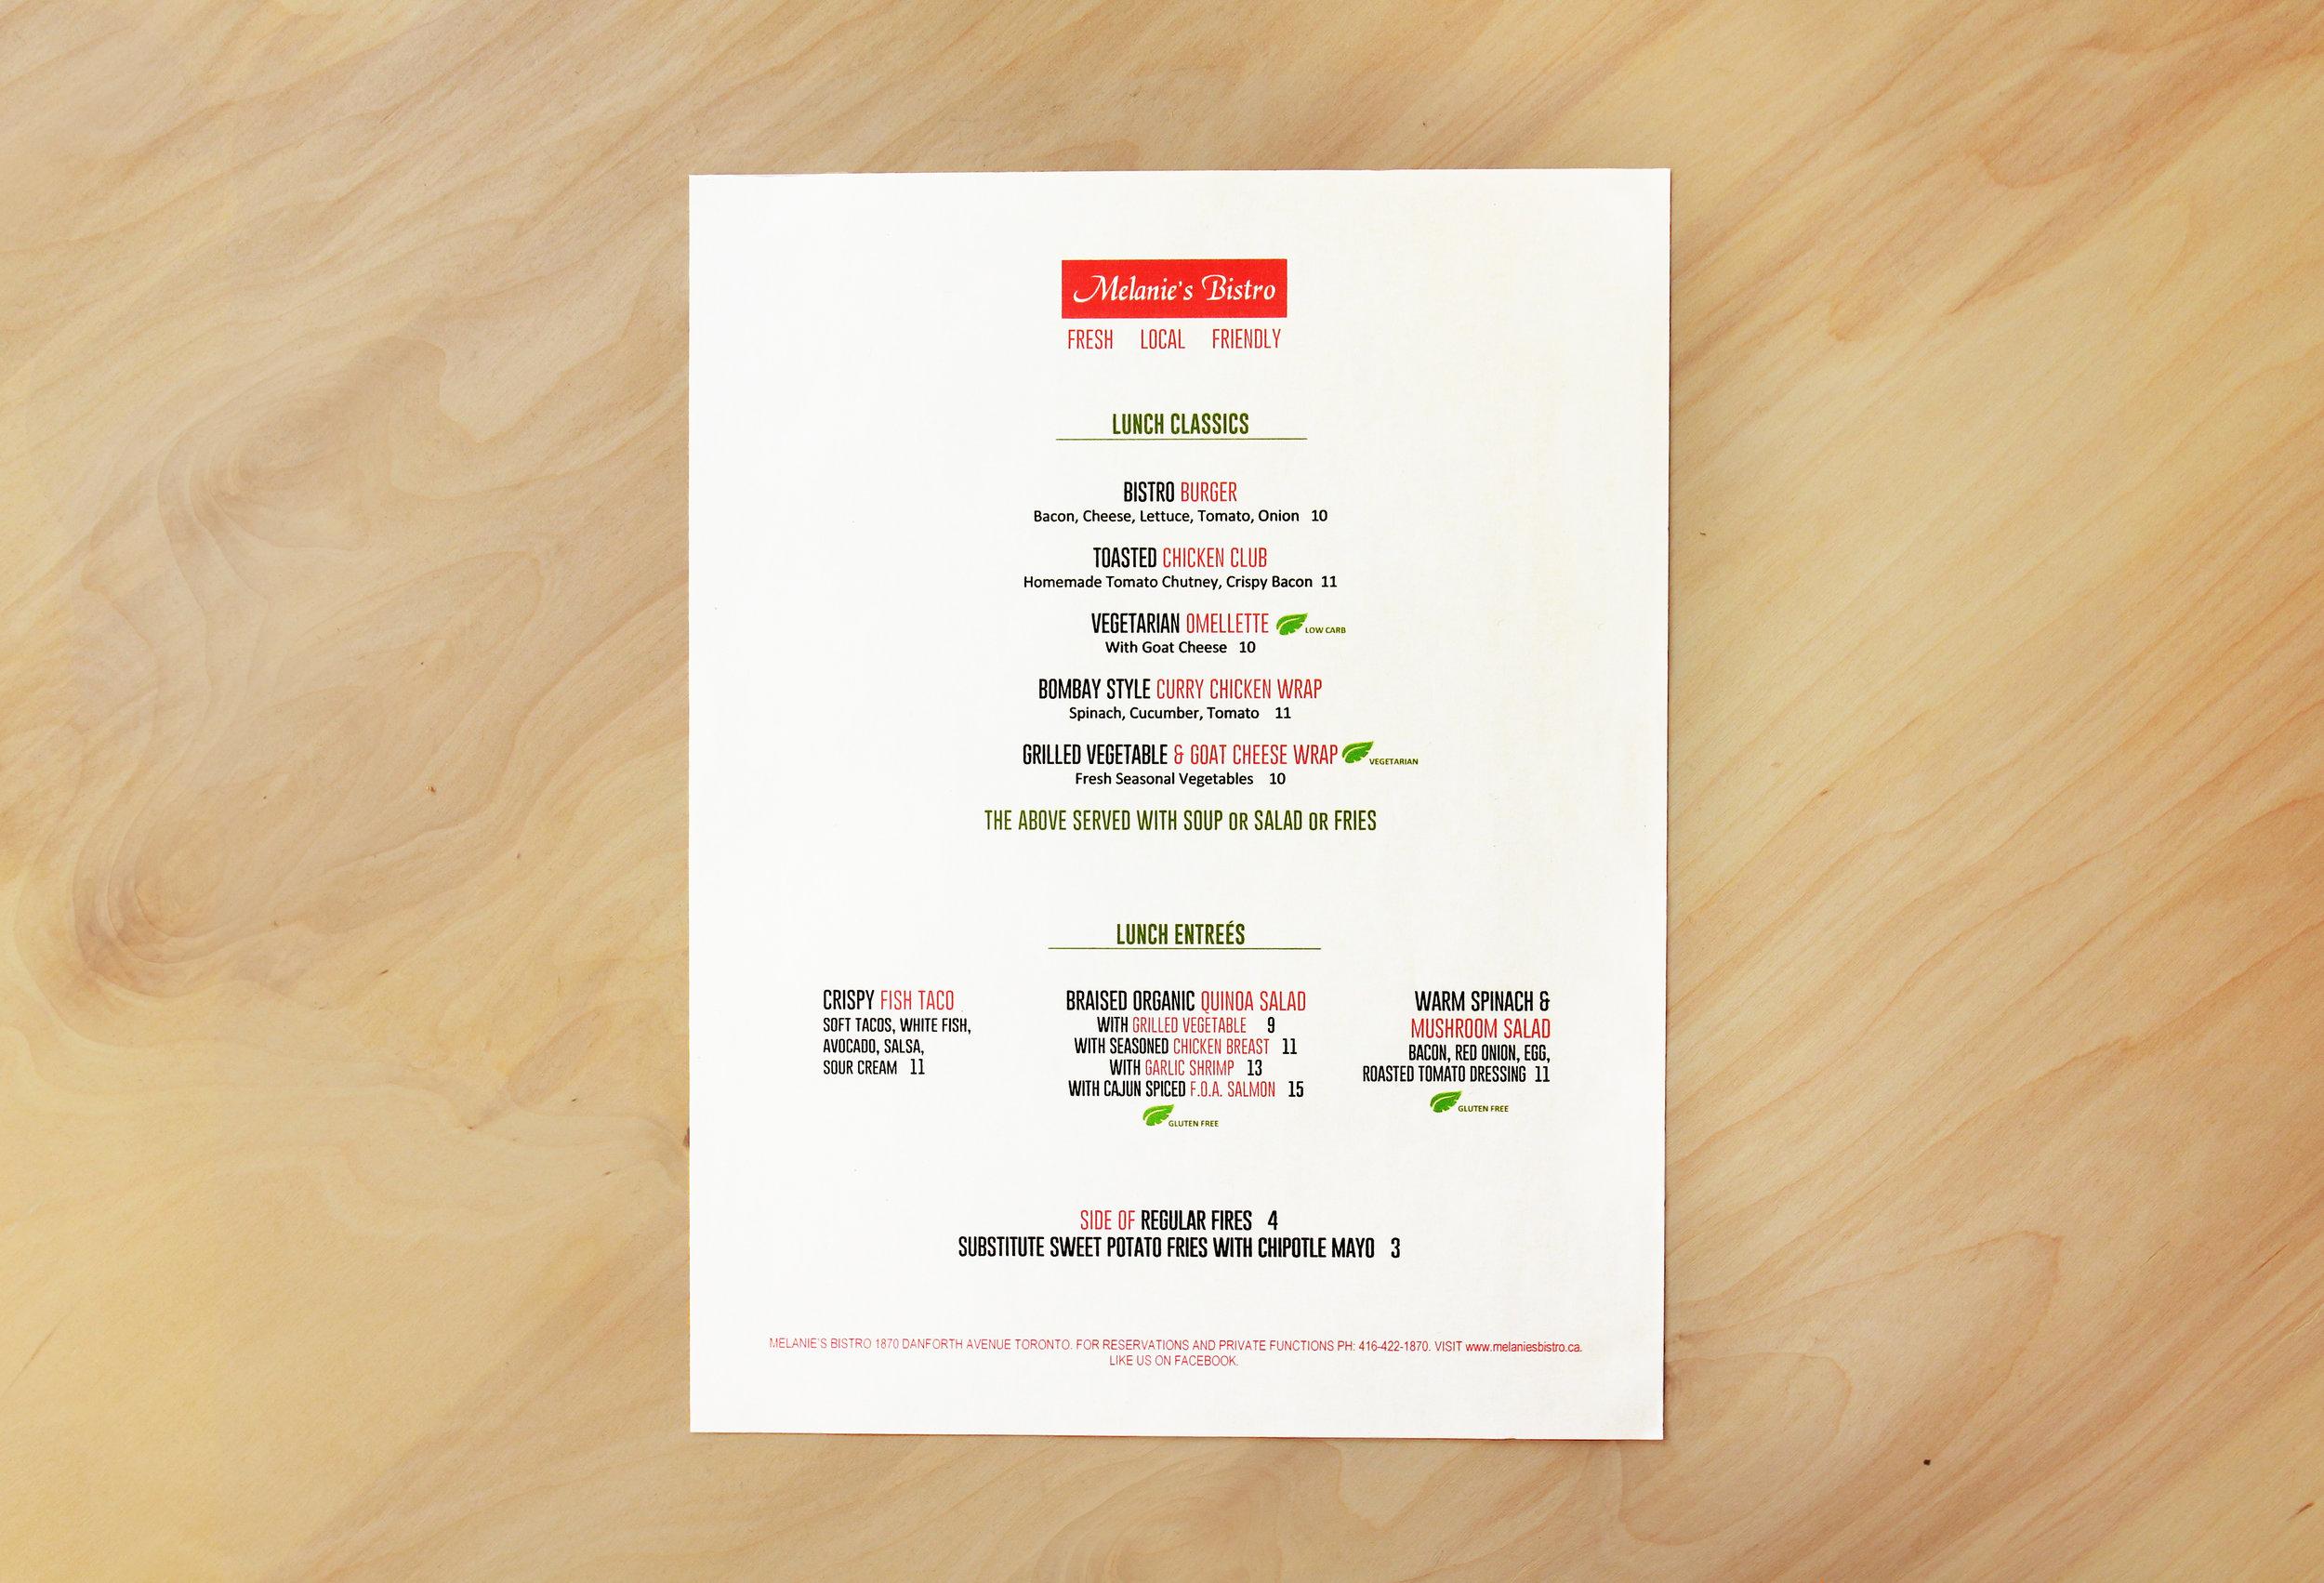 melanie's bistro menu 1